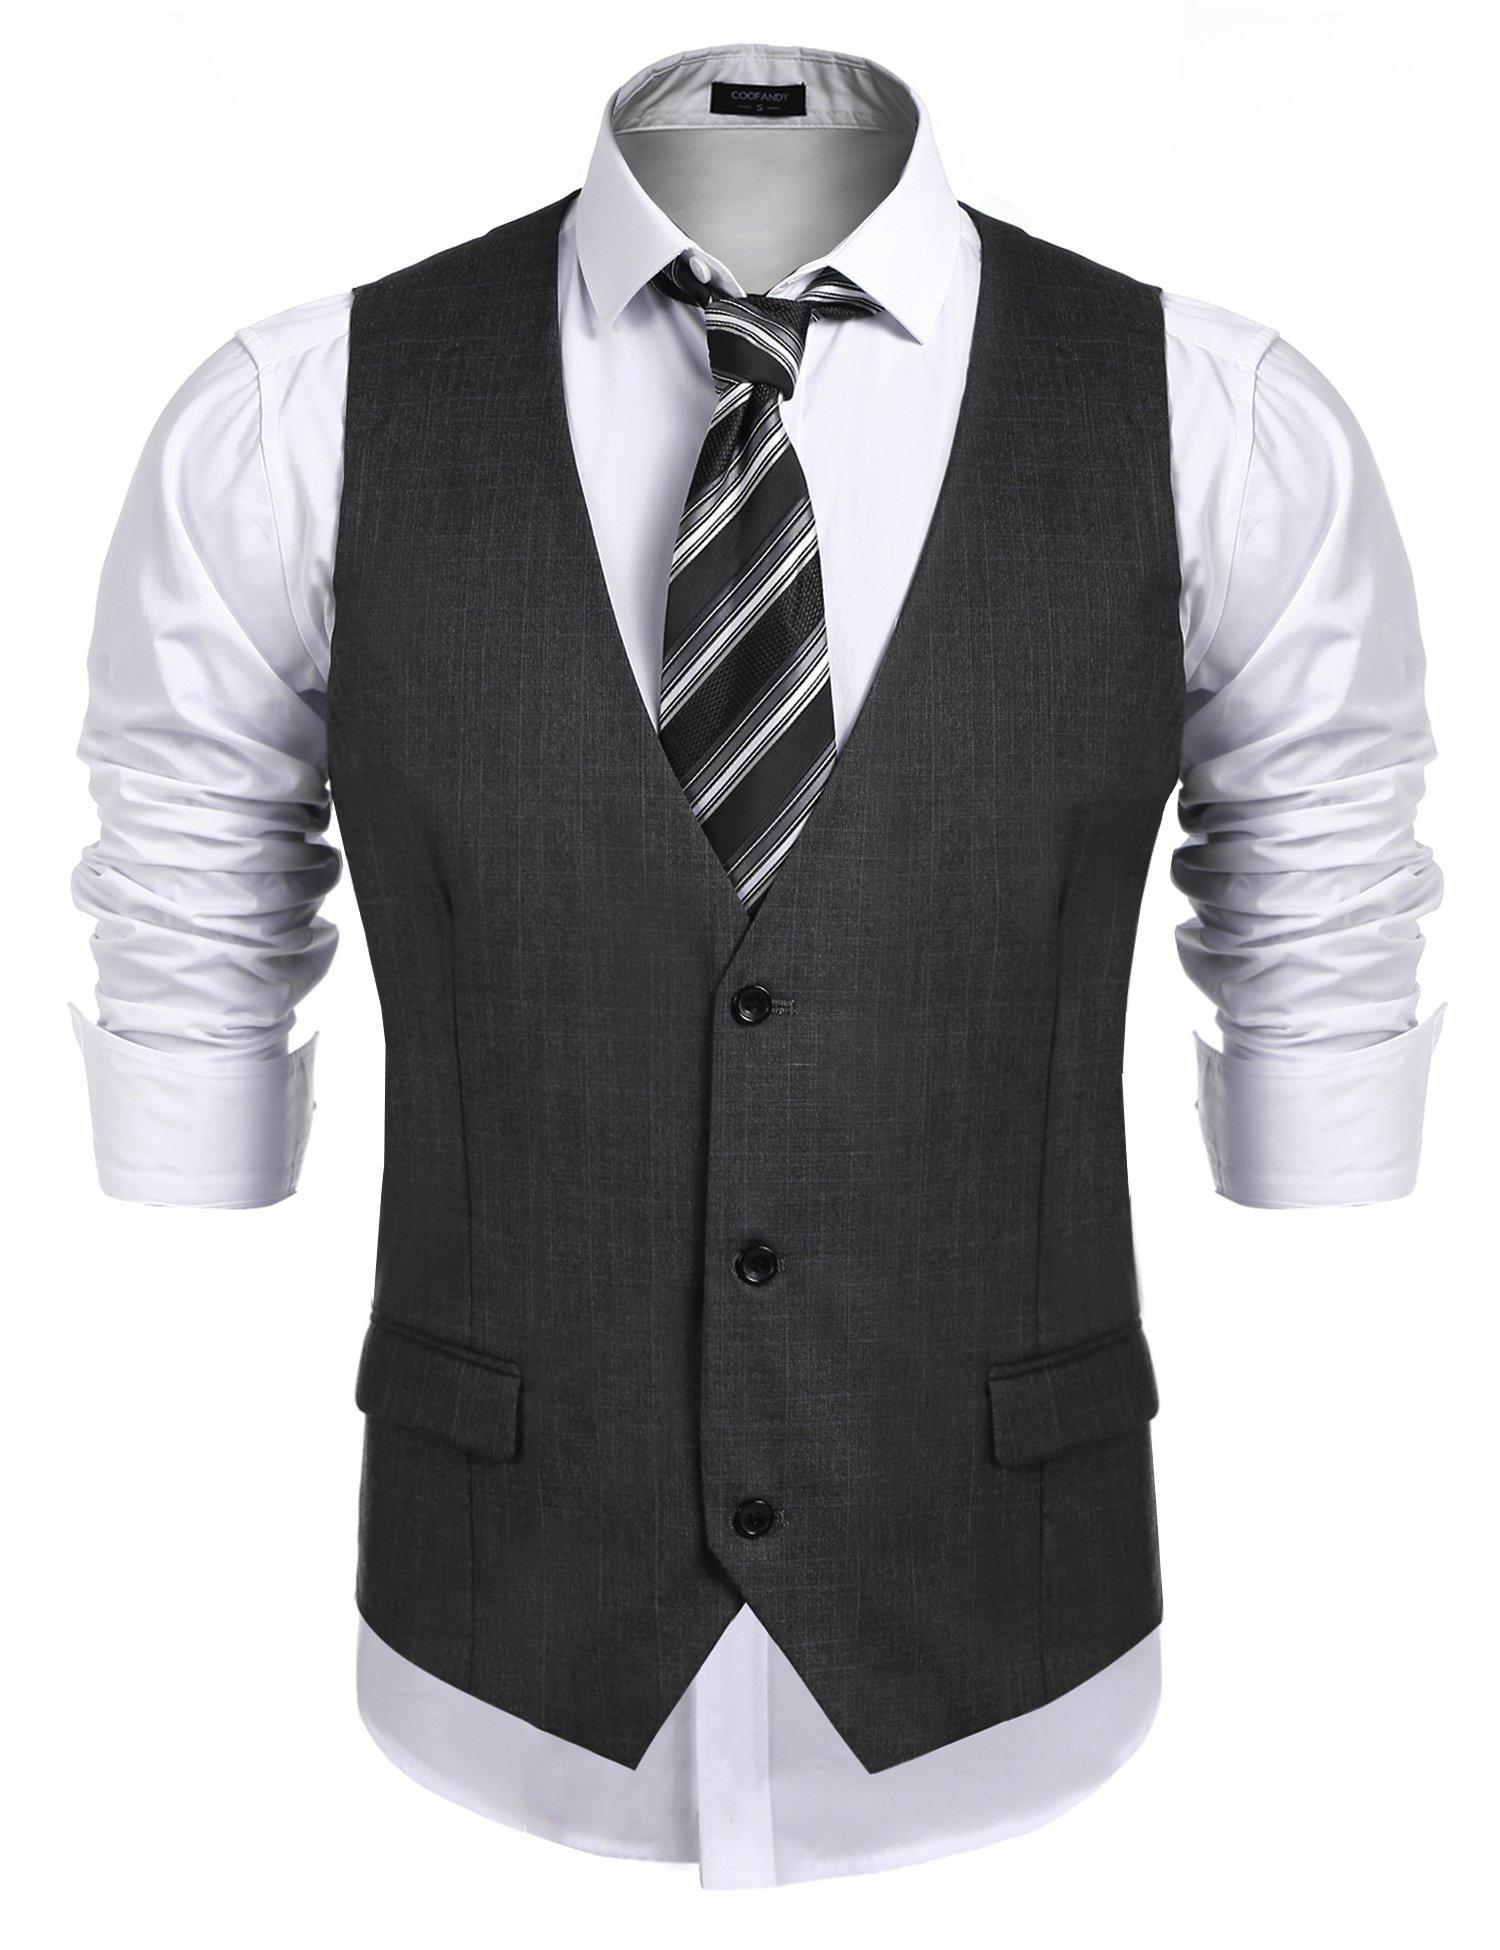 Coofandy Men's Business Suit Vest,Slim Fit Skinny Wedding Waistcoat,Large,Charcoal by COOFANDY